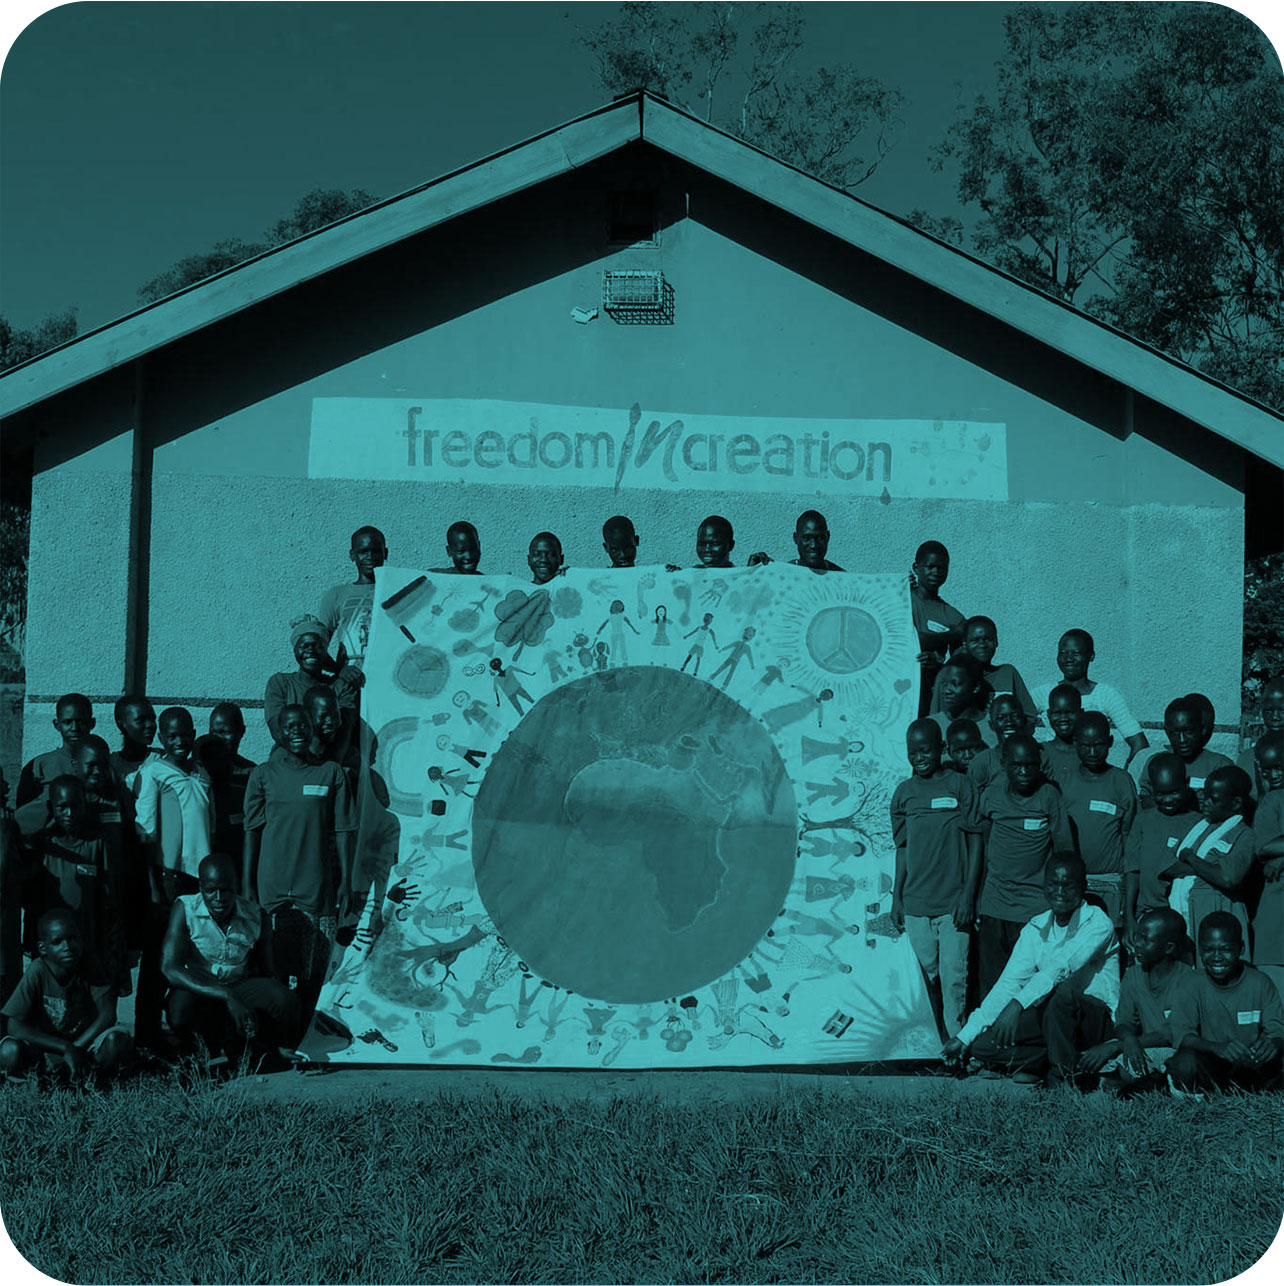 UGANDA - Solar power pump and permaculture farm in rural village